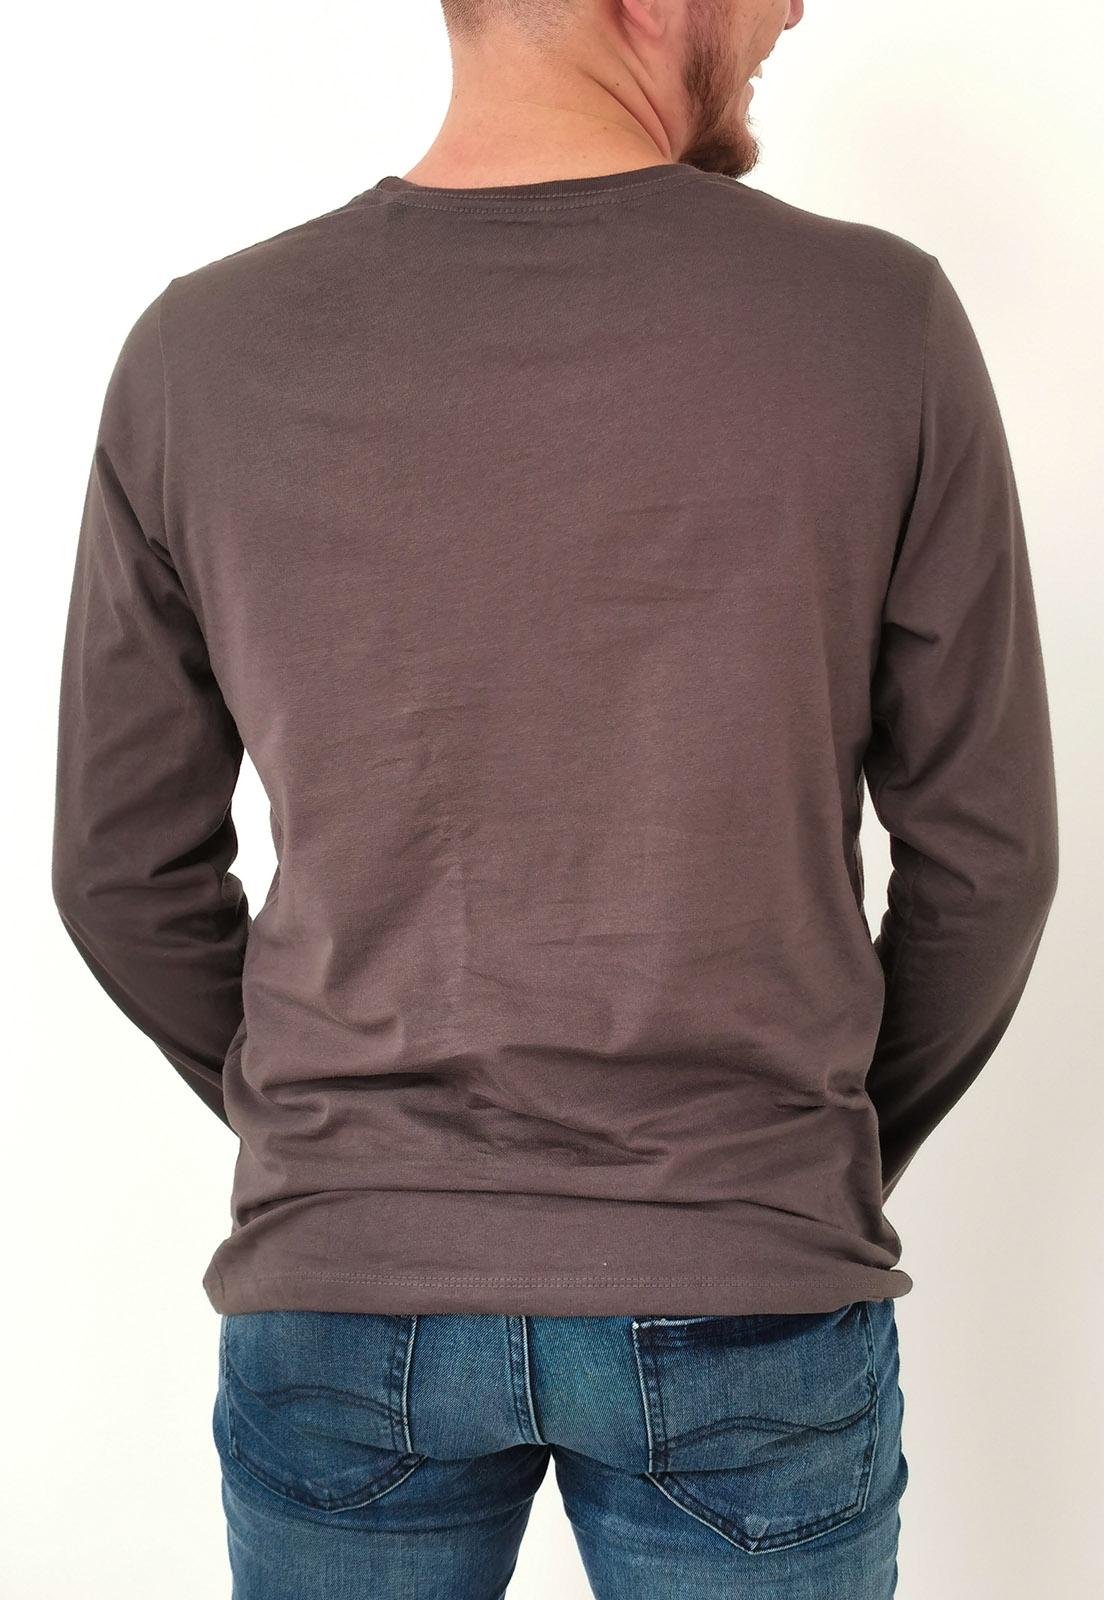 Camiseta Colcci Manga Longa Chumbo Básica